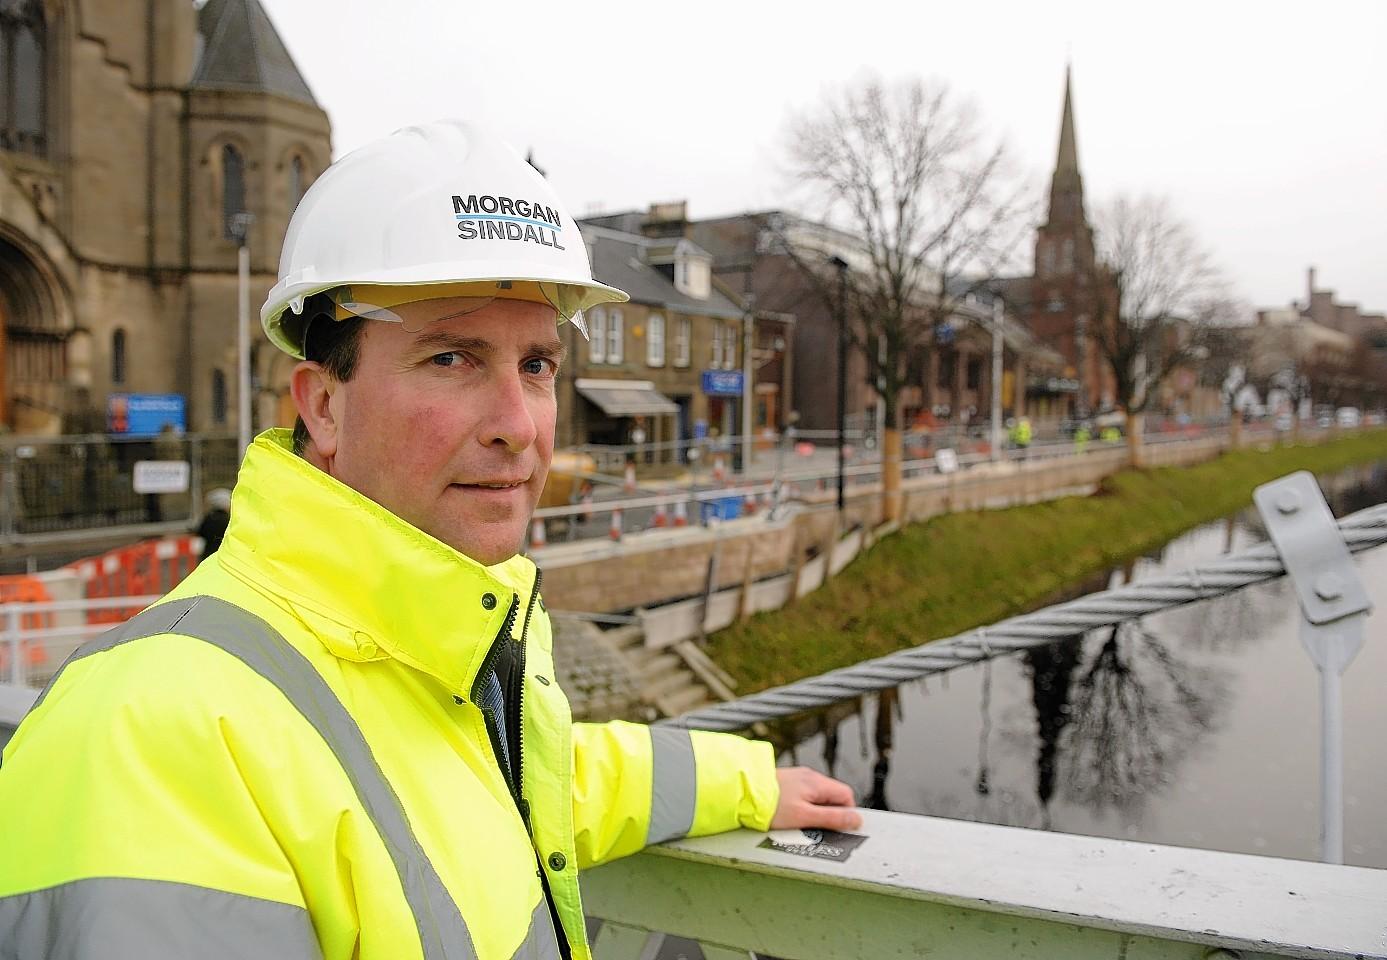 Robert Ogg, of Morgan Sindall, at the River Ness Flood Alleviation Scheme.